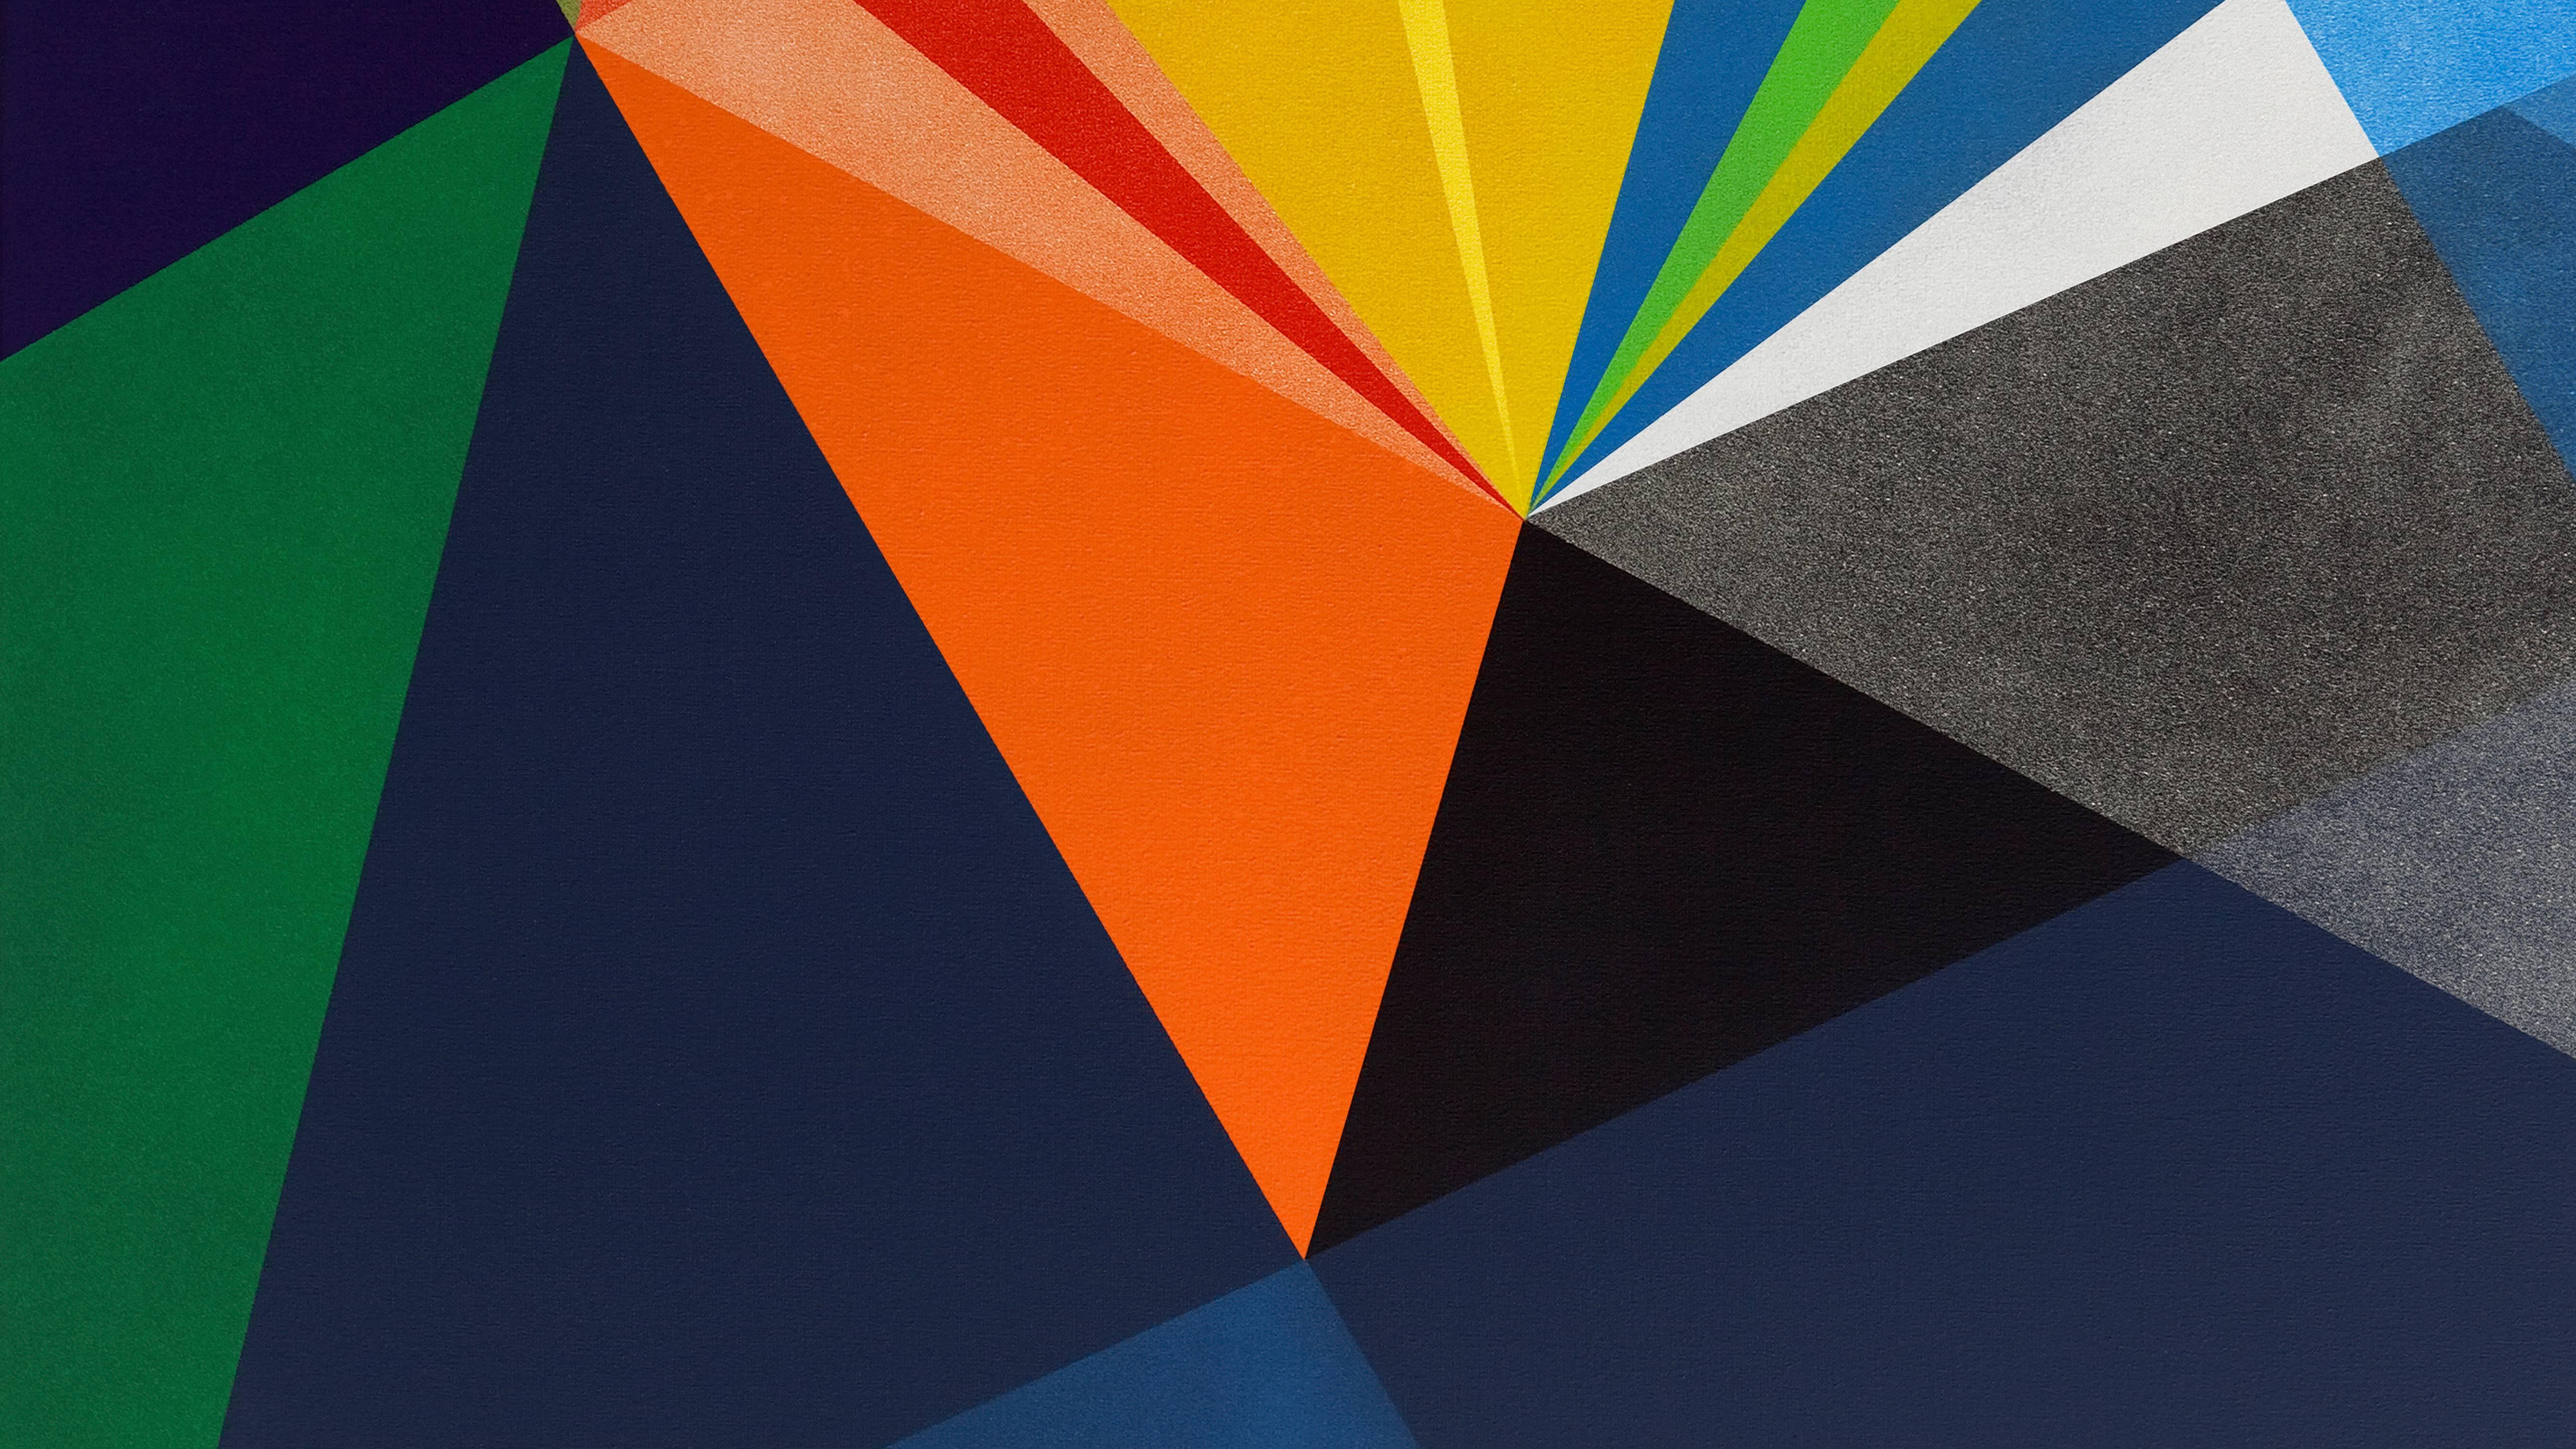 Material Abstract Shapes Wallpaper Hd Abstract 4k